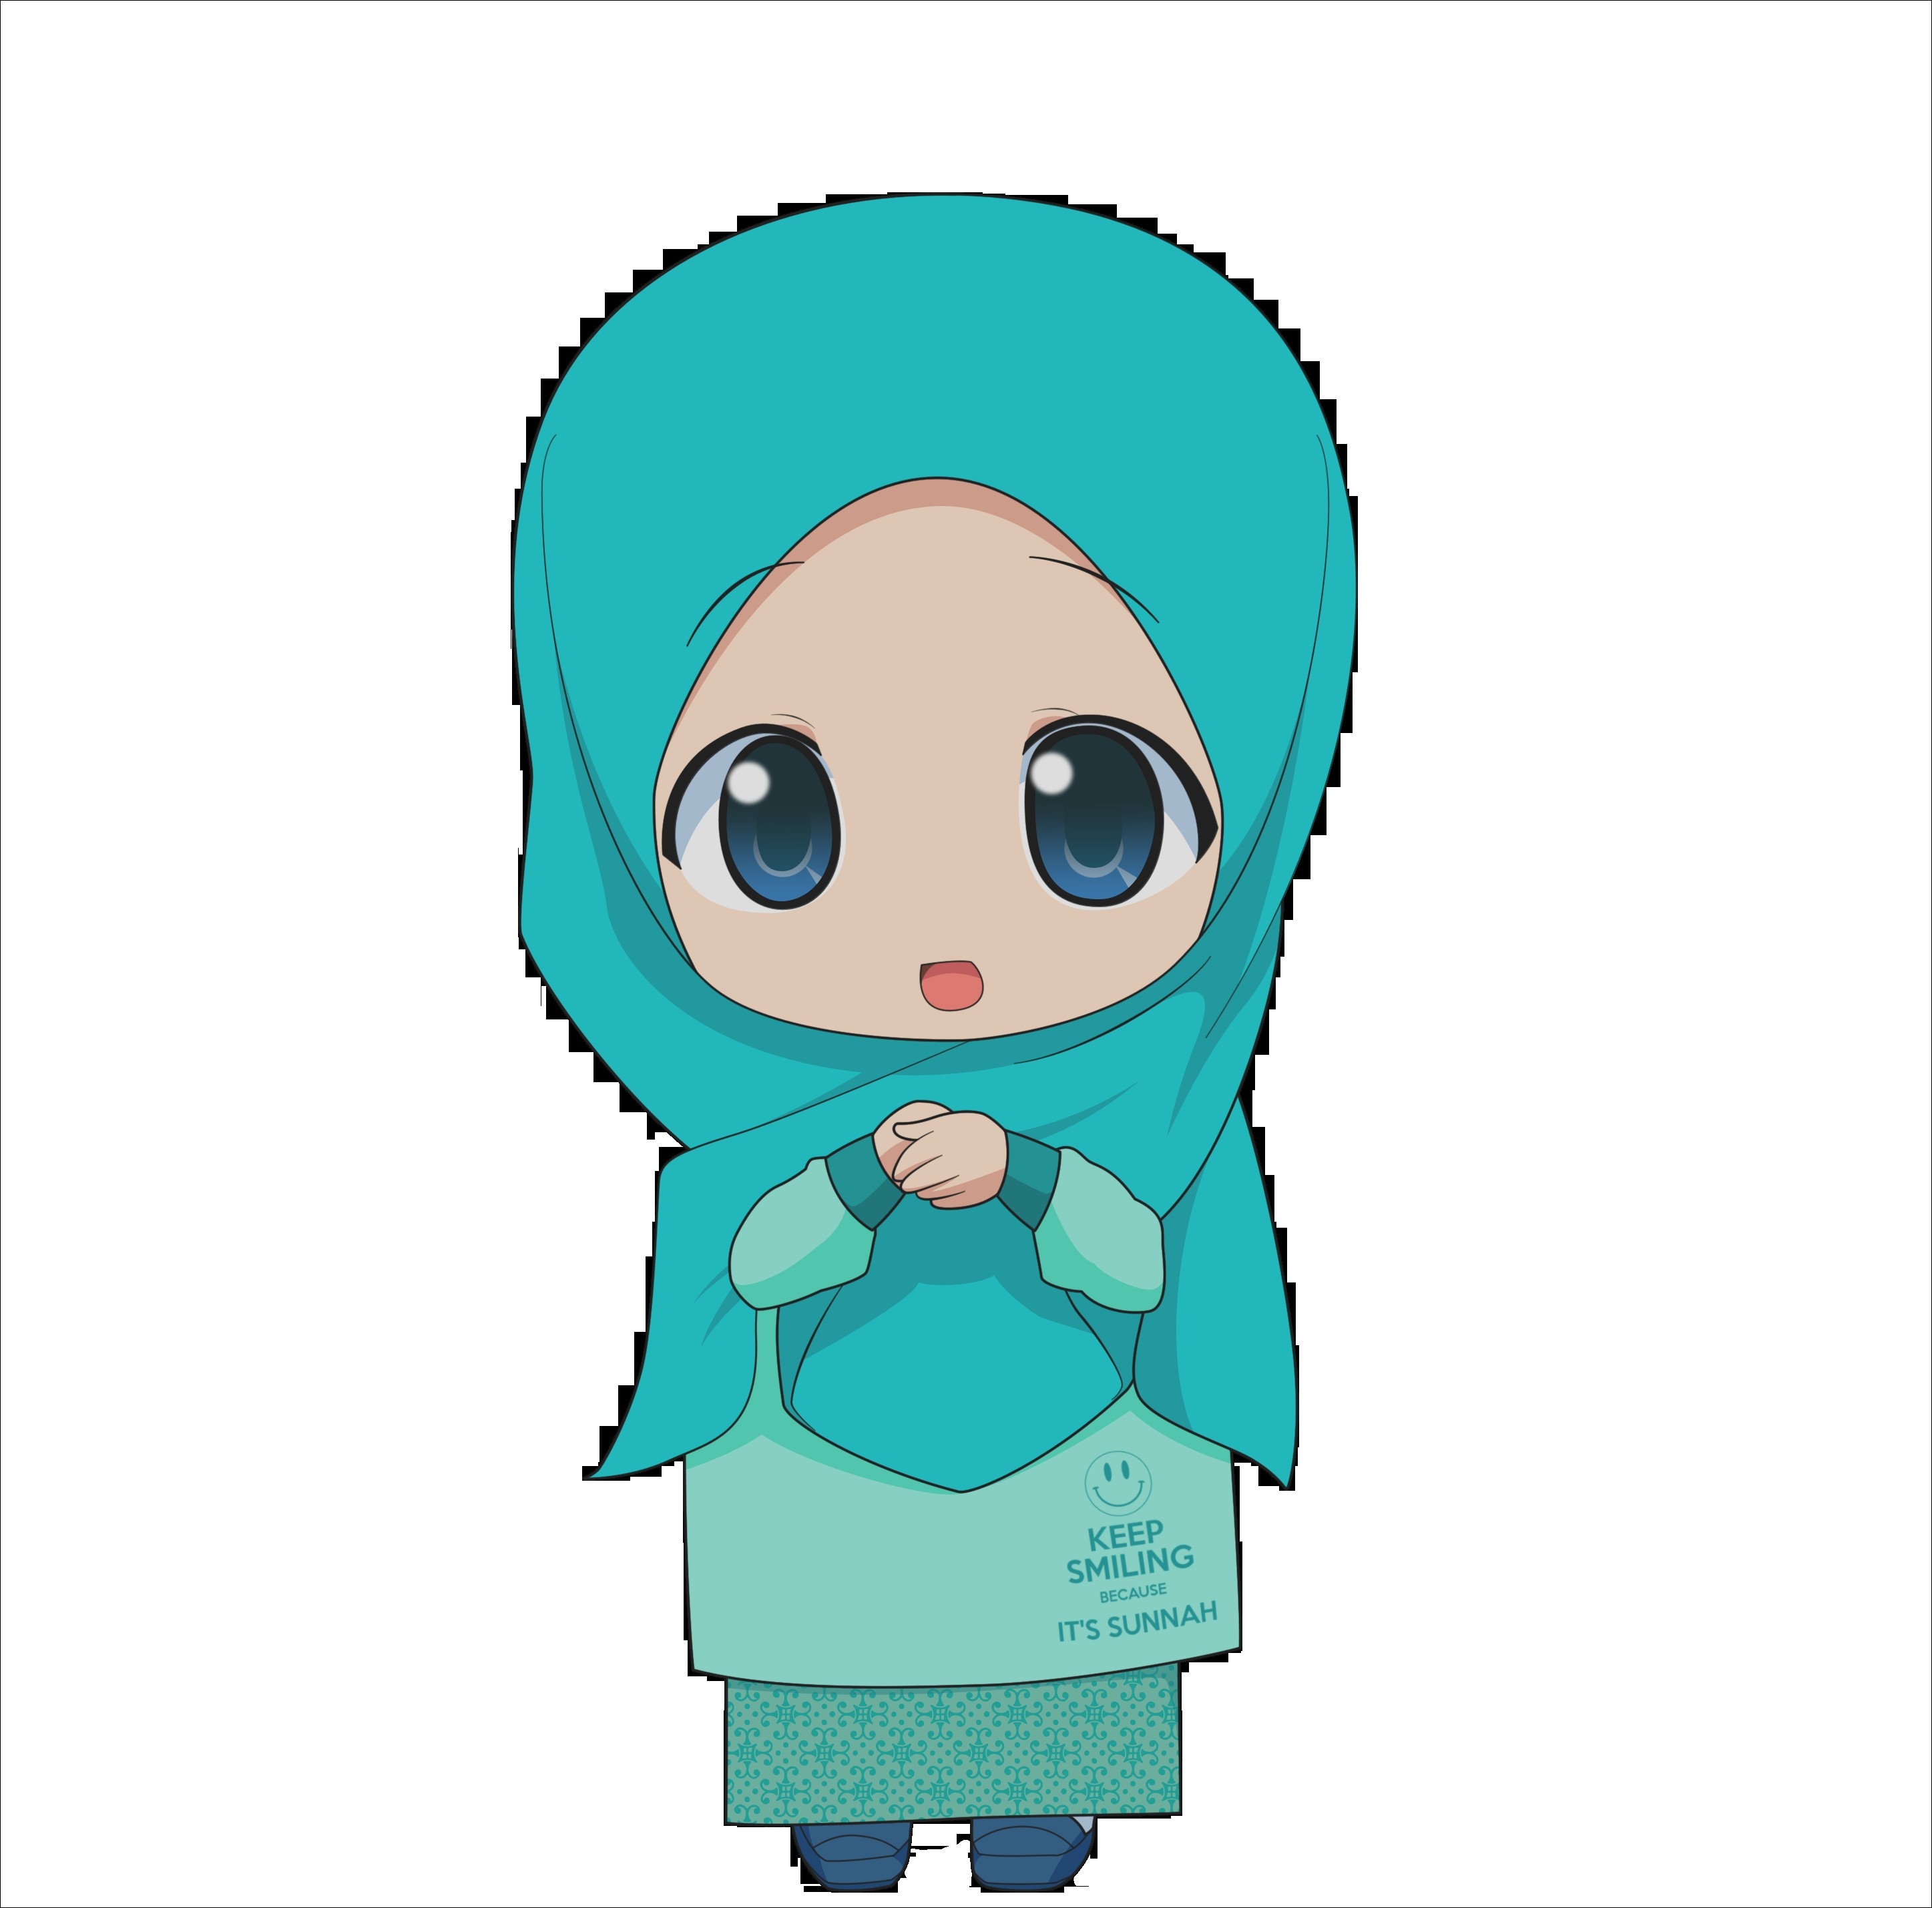 Gambar Kartun Muslimah Lucu Imut